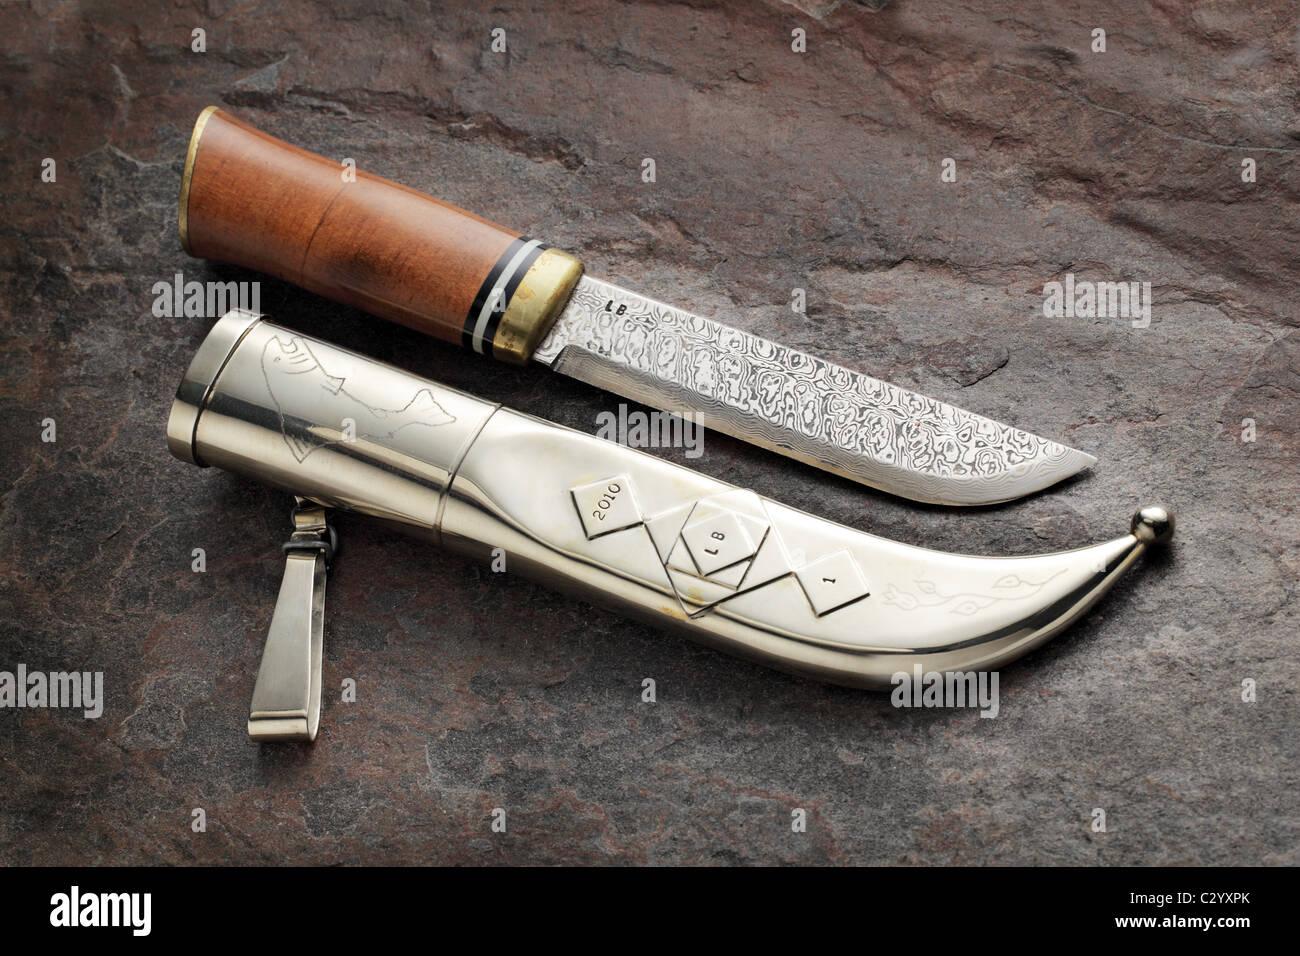 Handmade finnish 'puukko' knife. A puukko is a traditional Finnish or Scandinavian style belt-knife. - Stock Image